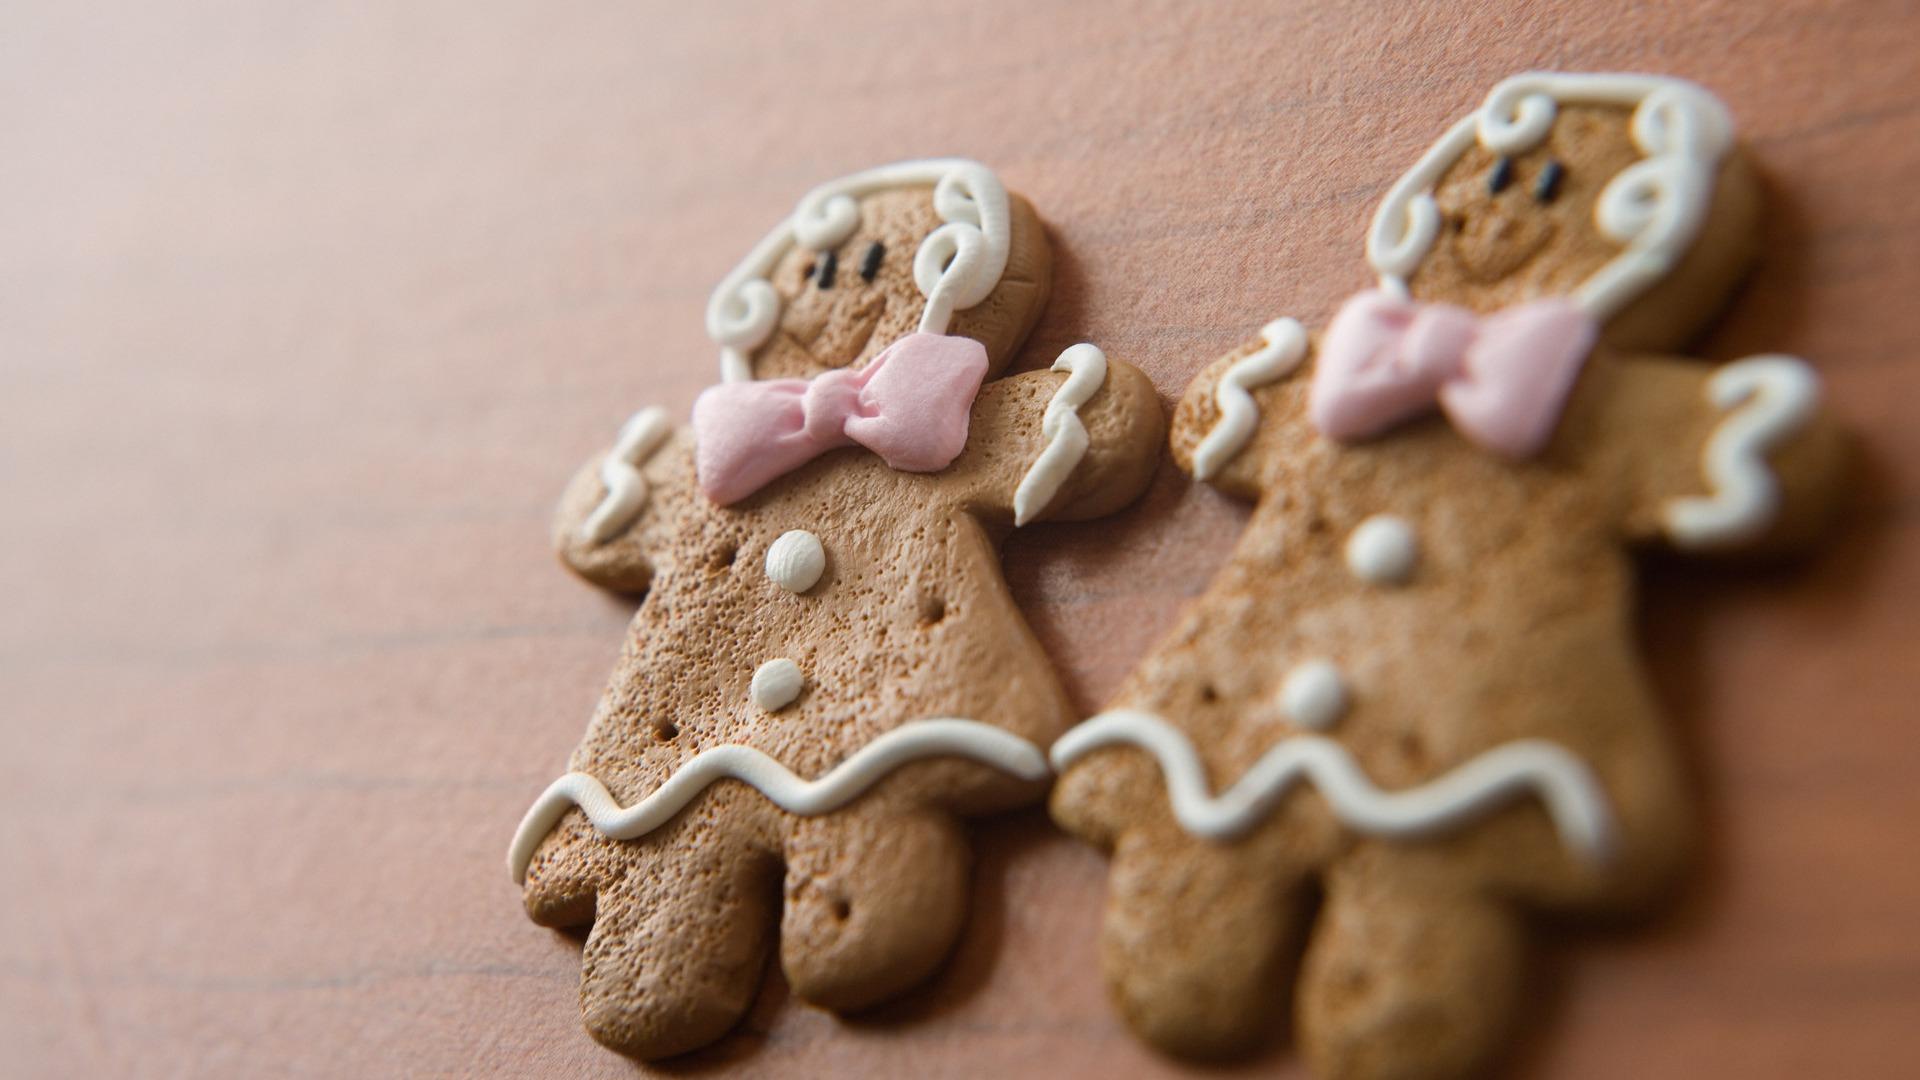 Festivals Christmas Gingerbread Man Snack Wallpaper